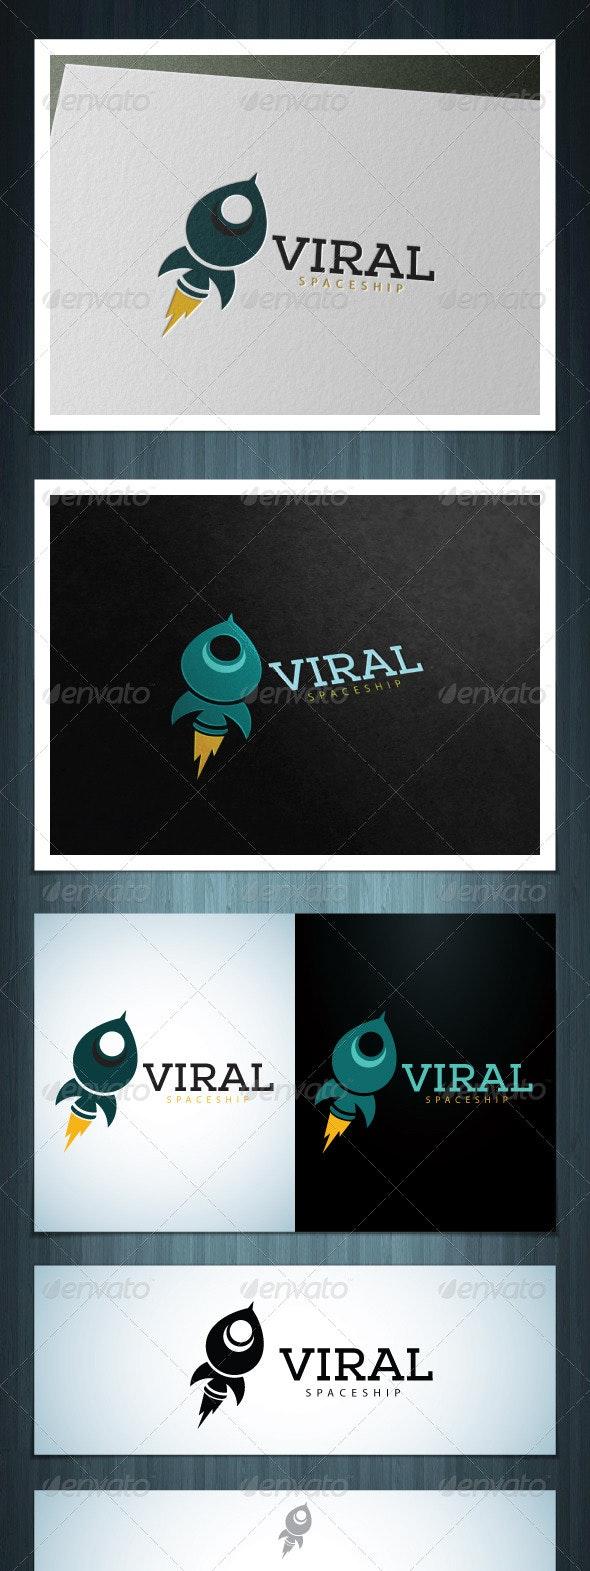 Viral Spaceship - Vector Abstract